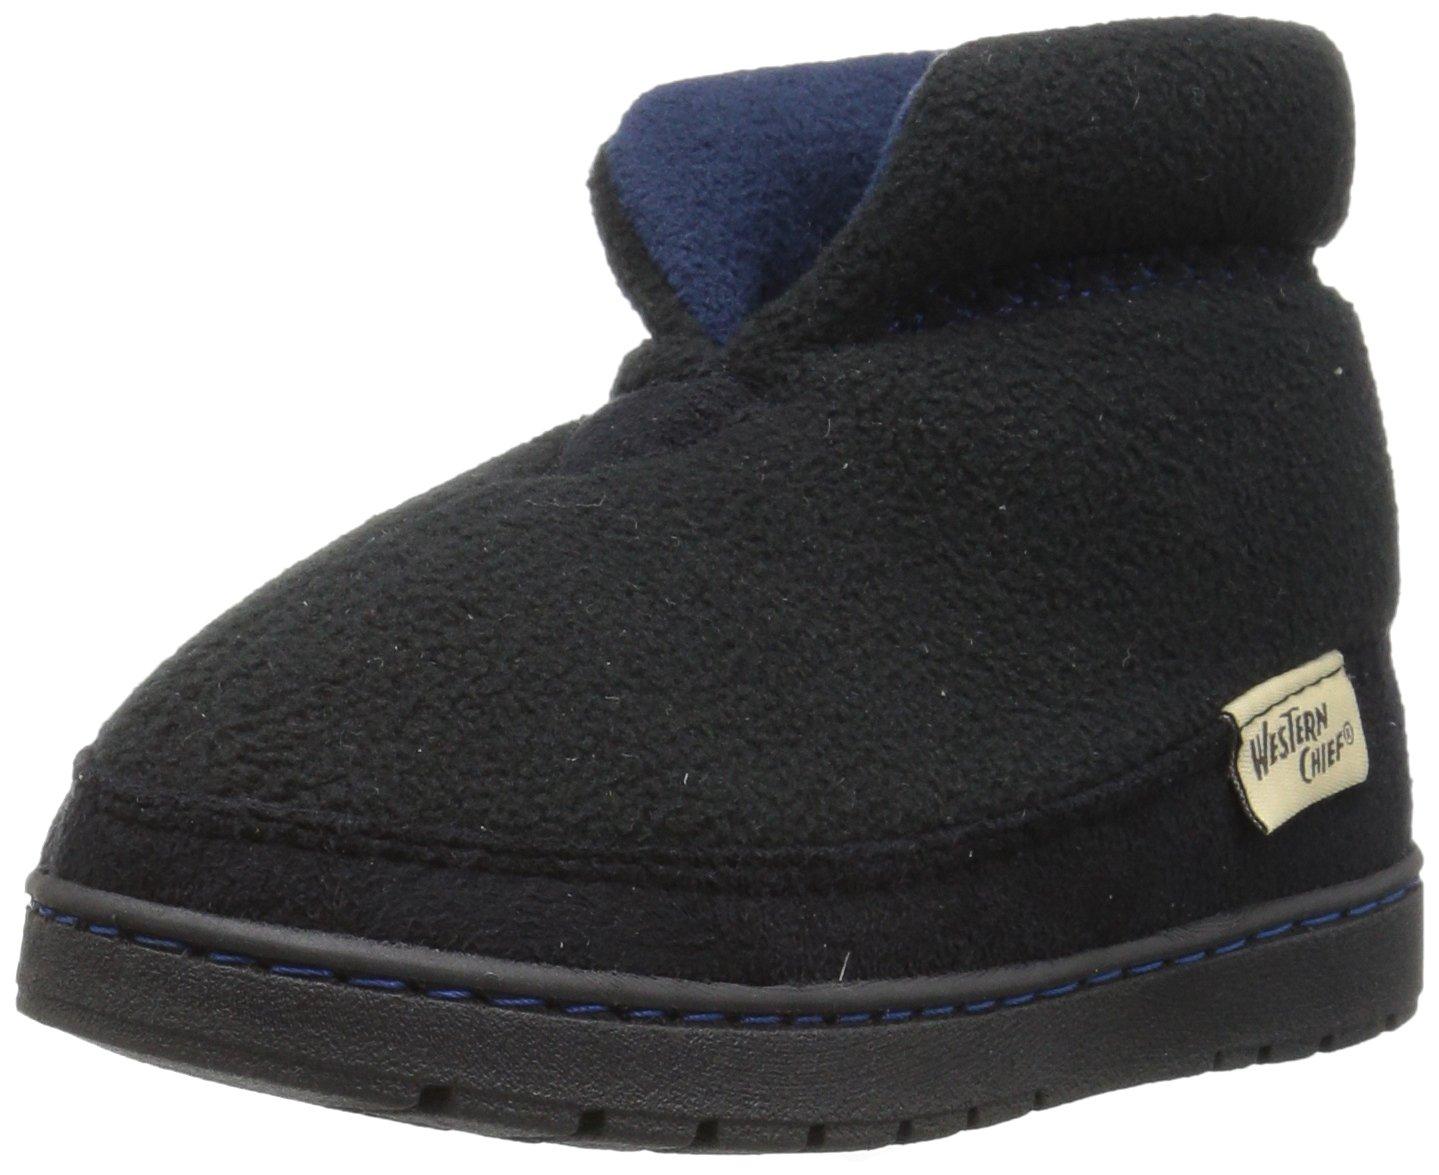 Western Chief Kids Plush Slipper Boot, Black, 2 M US Little Kid